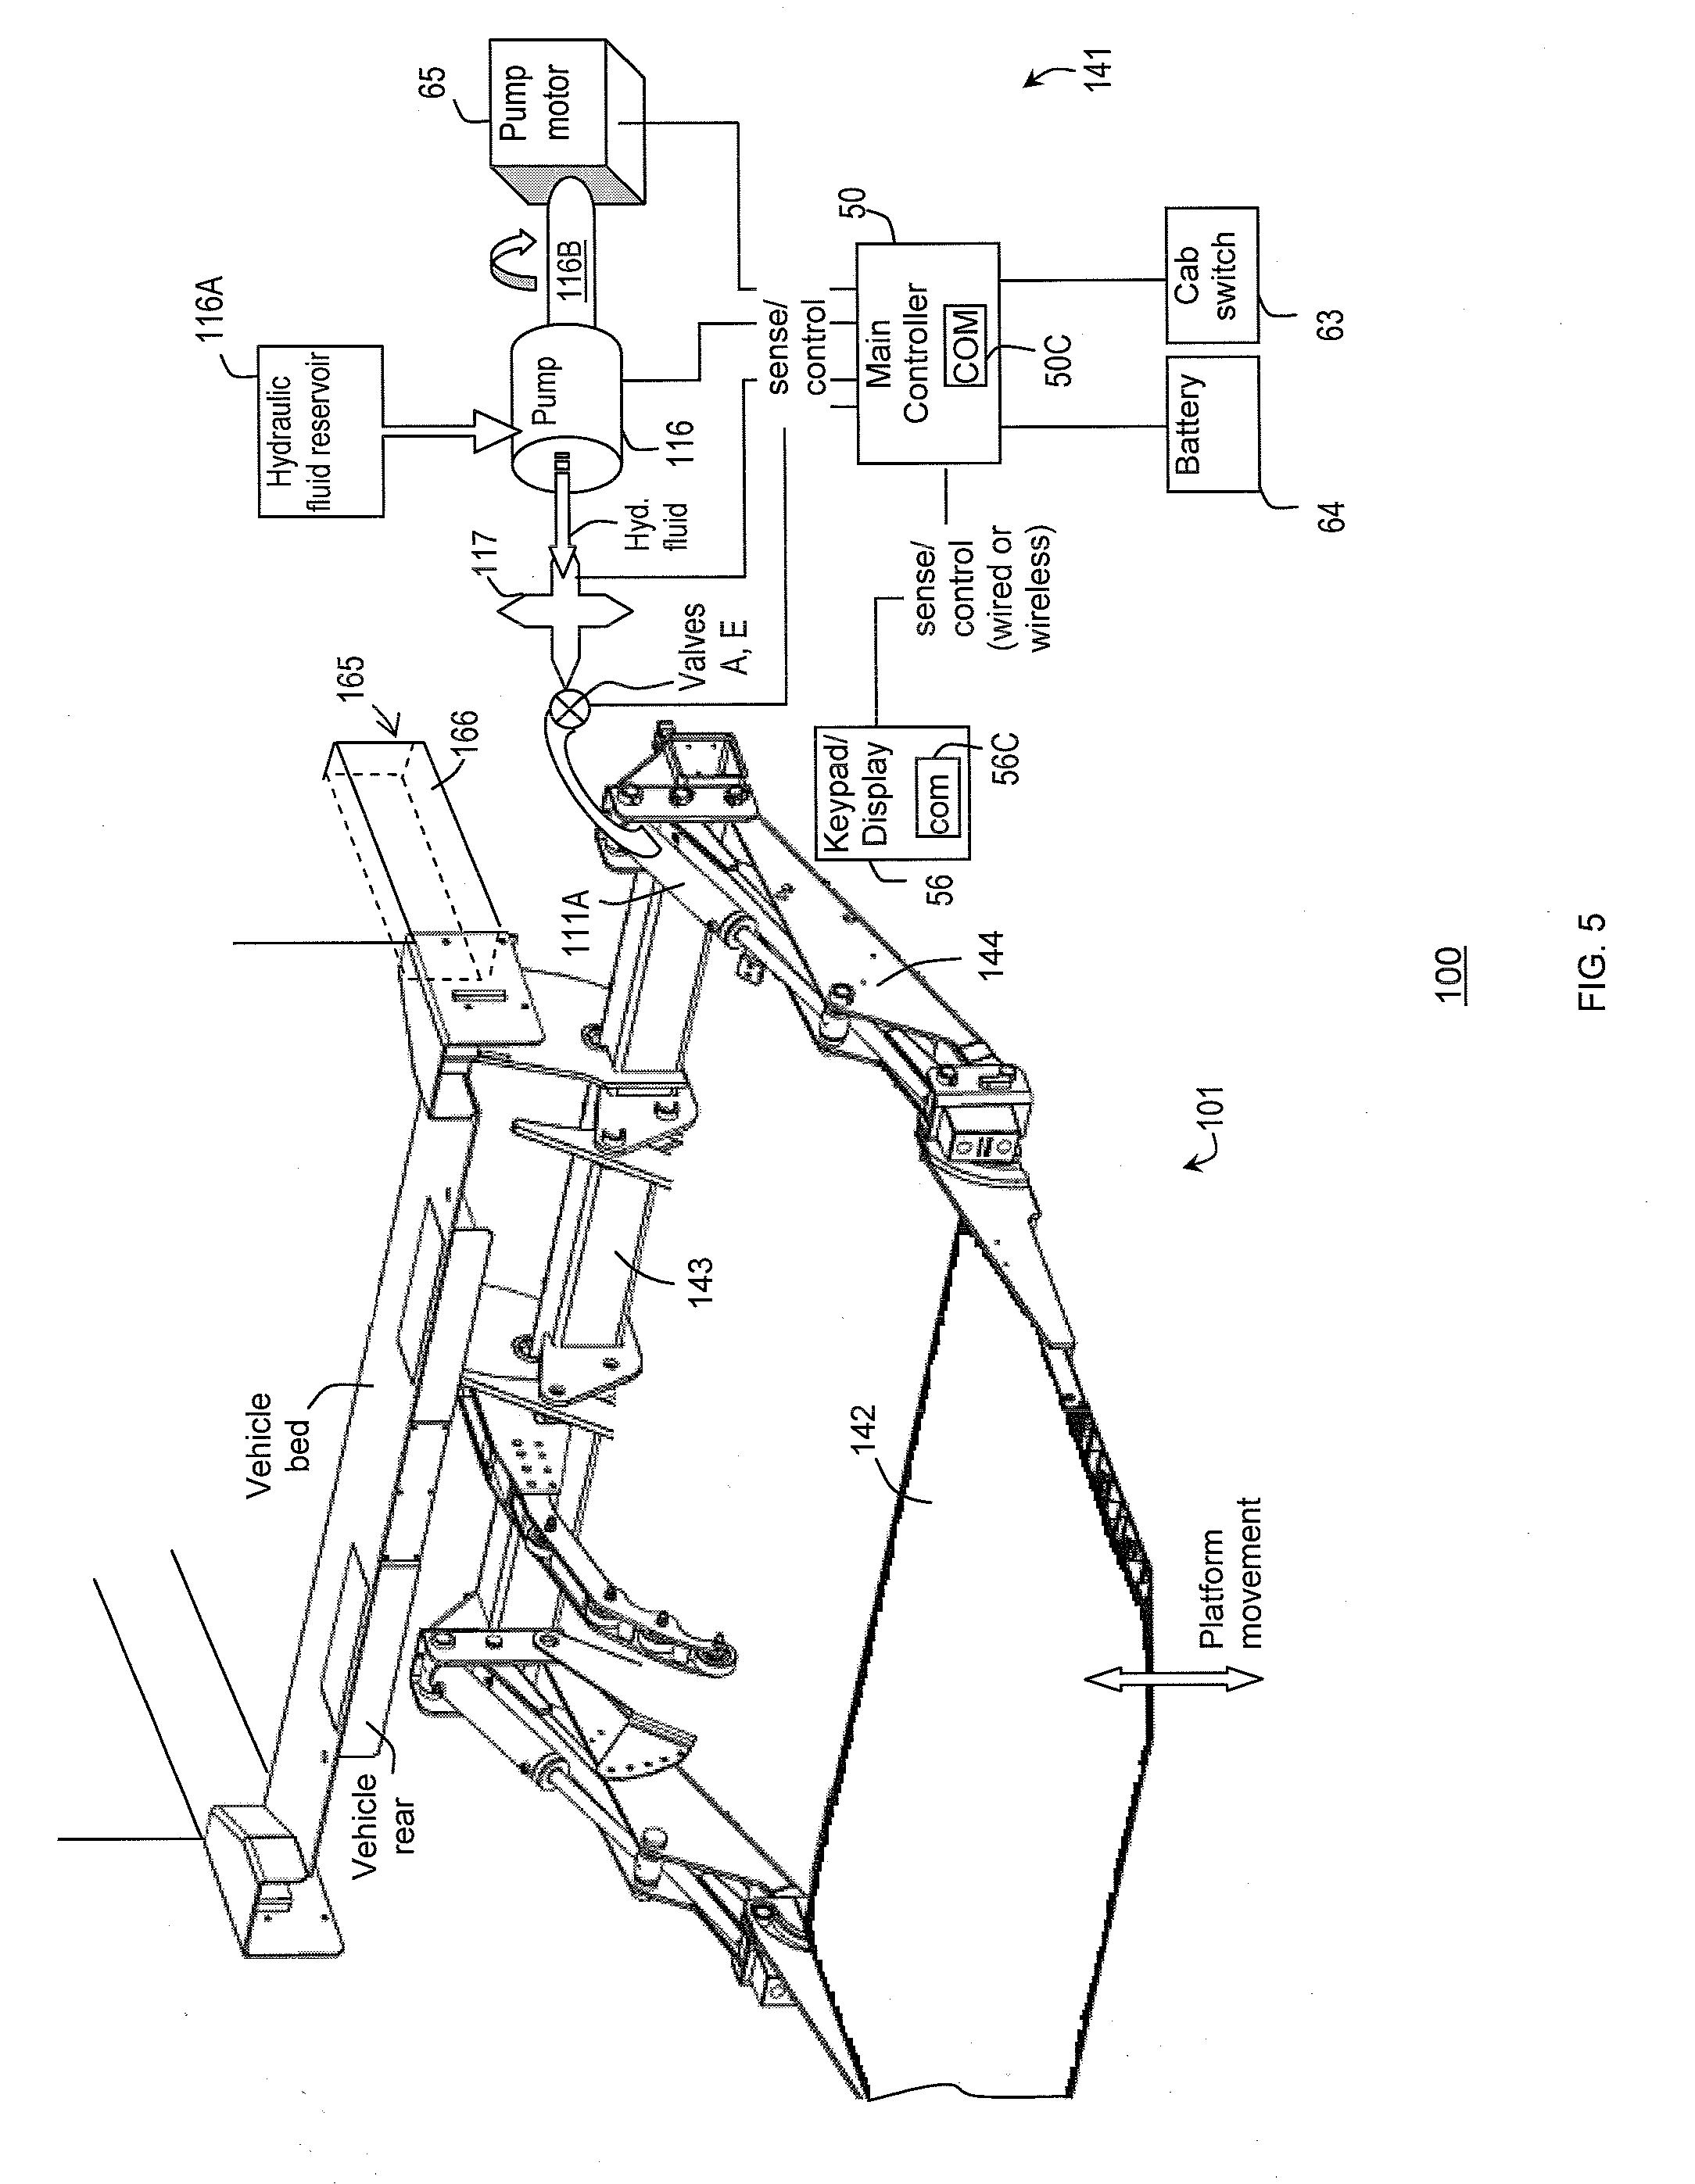 Wiring Diagram for Auto Lift #diagram #diagramtemplate #diagramsamplePinterest